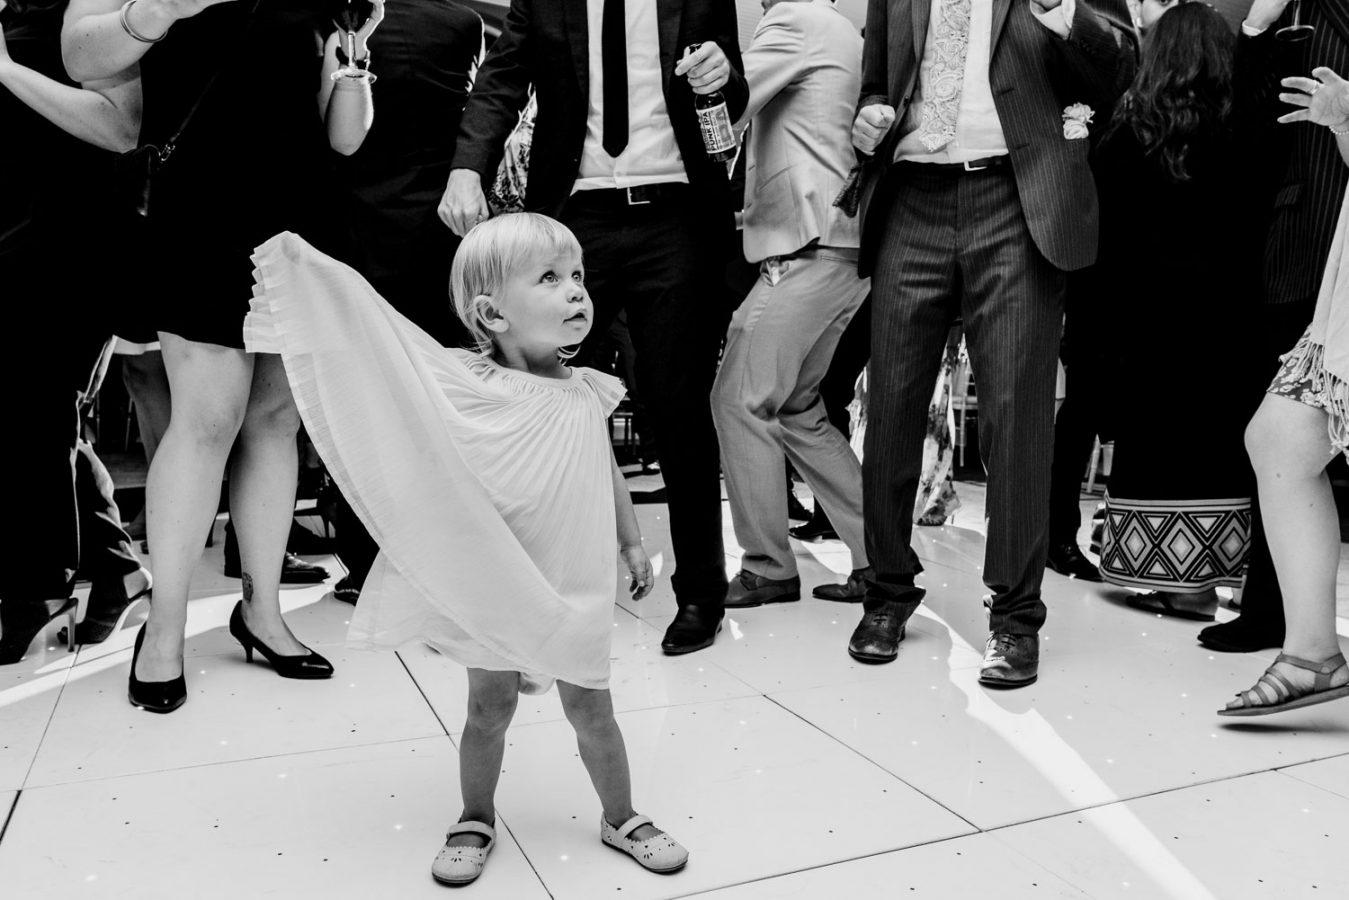 Little girl bossing the wedding dance floor